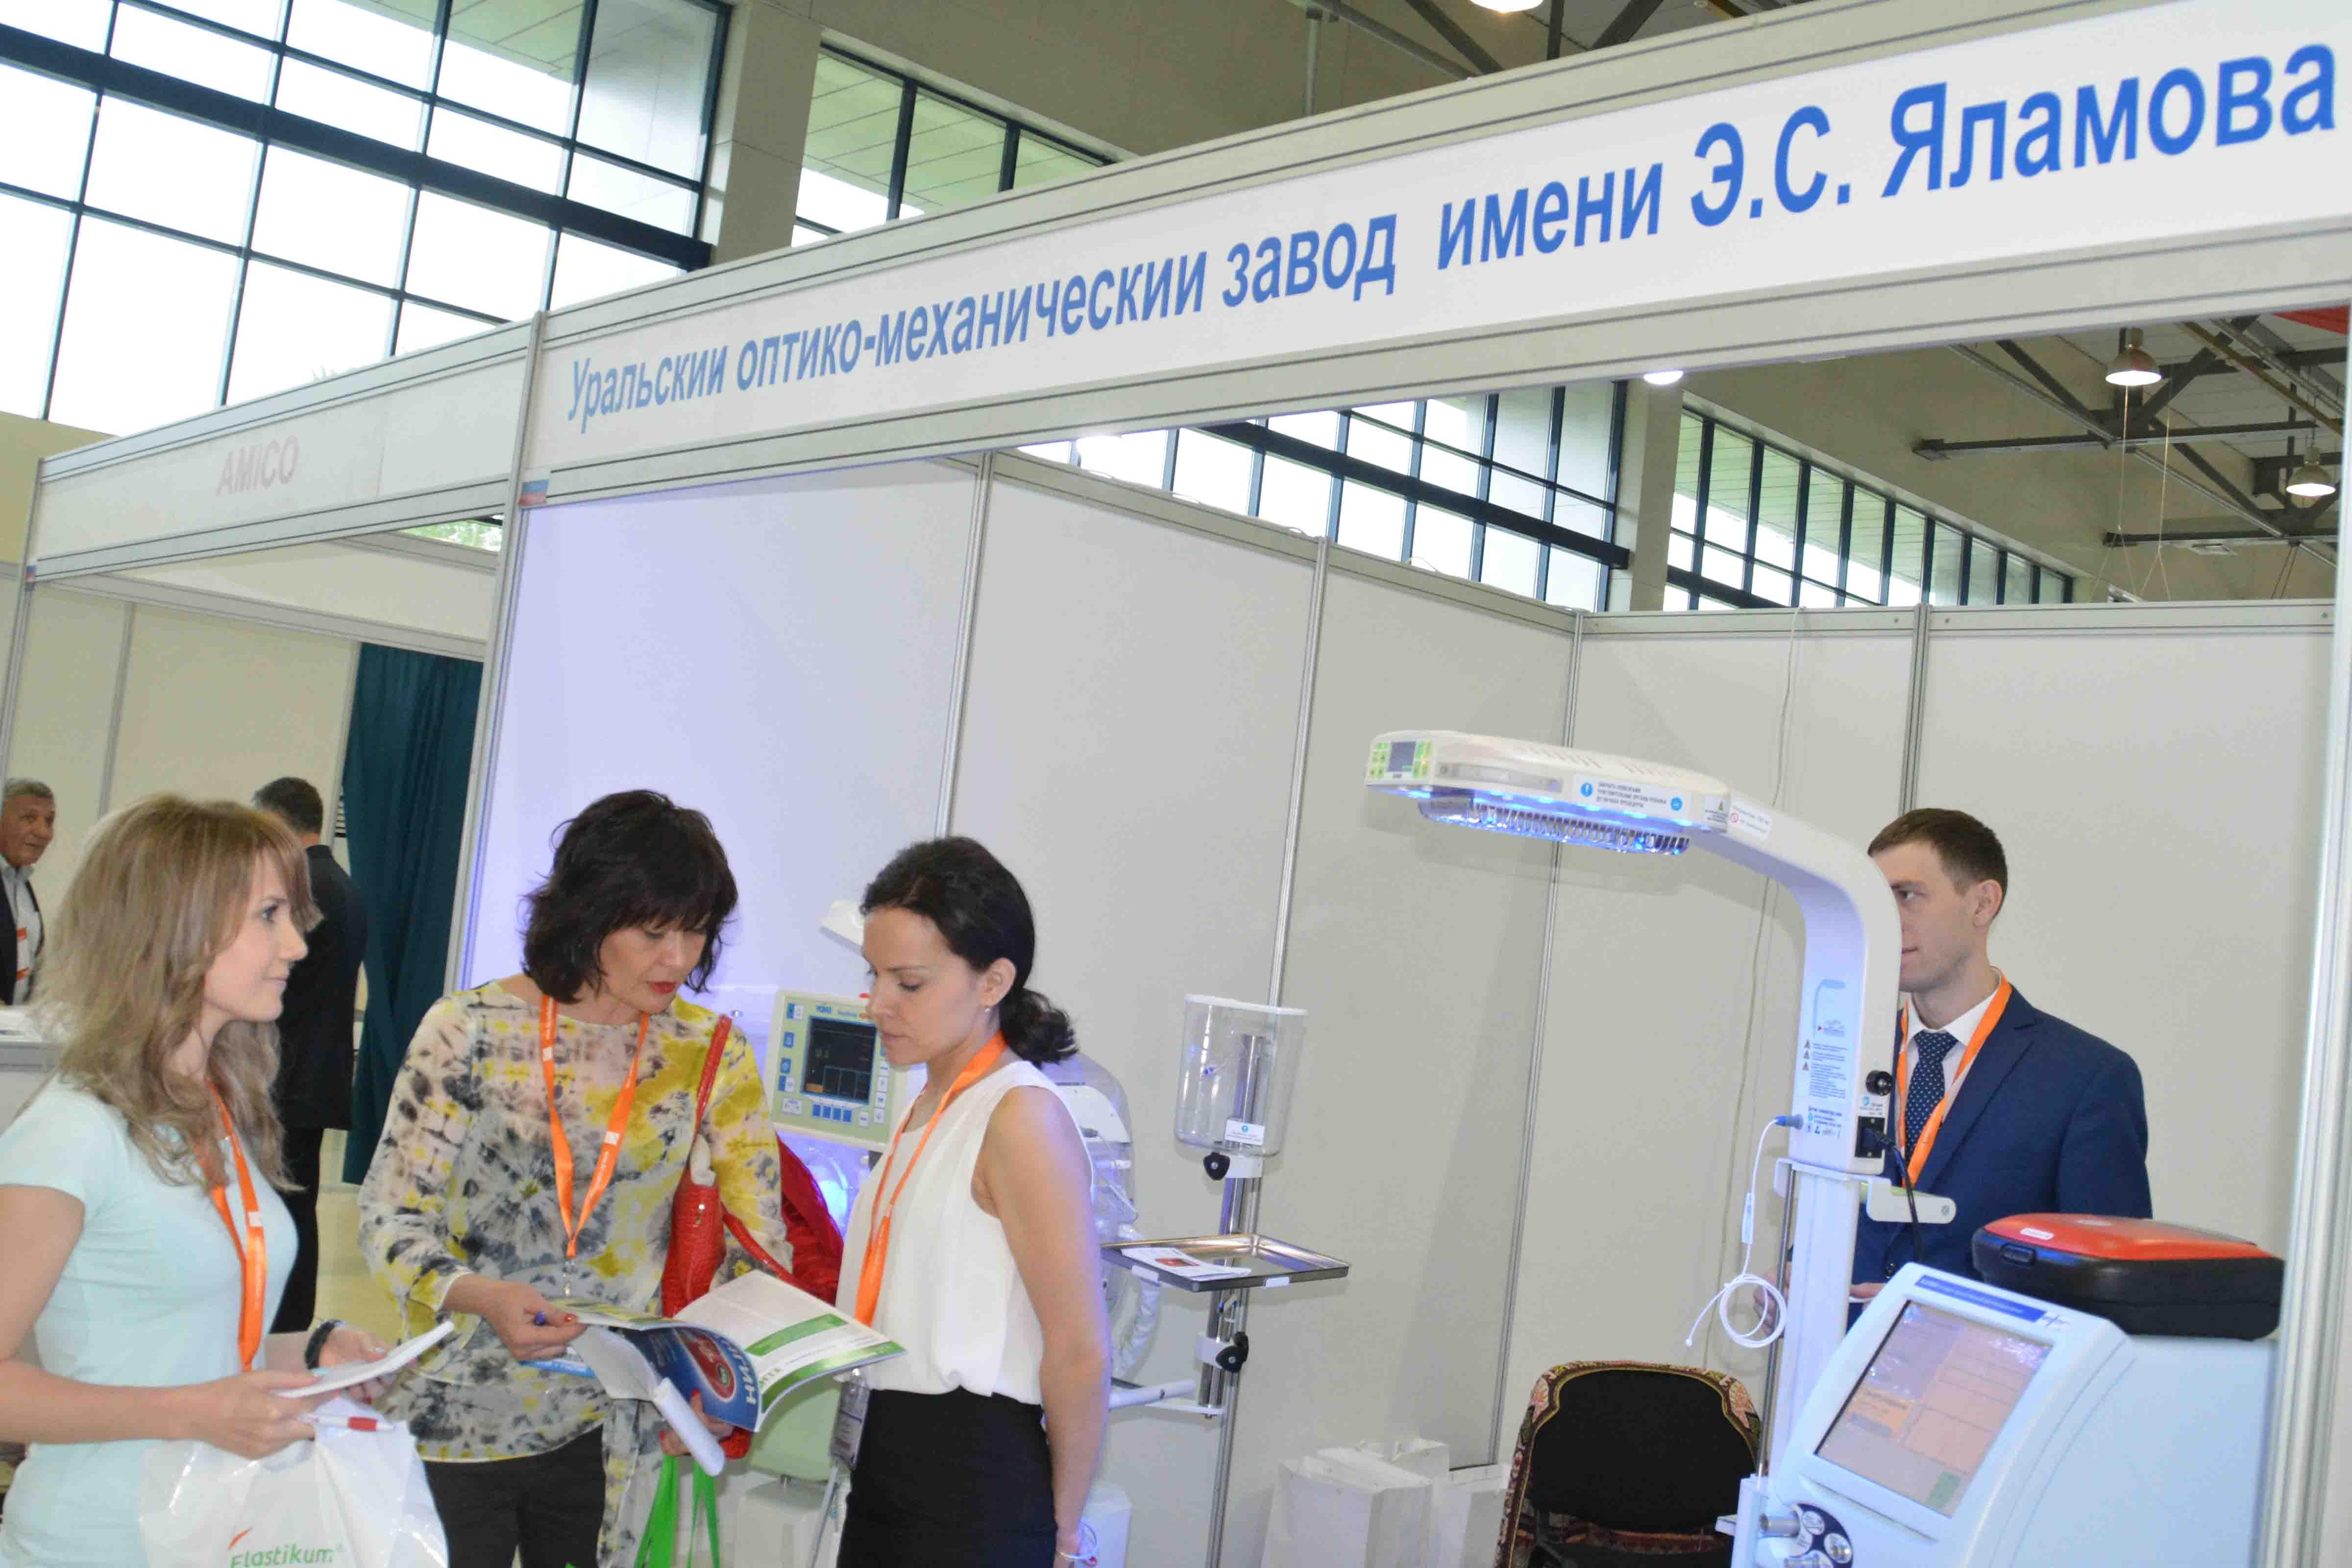 http://medicalexpress.ru/uploads/news/Tihe%202017/DSC_9093.JPG